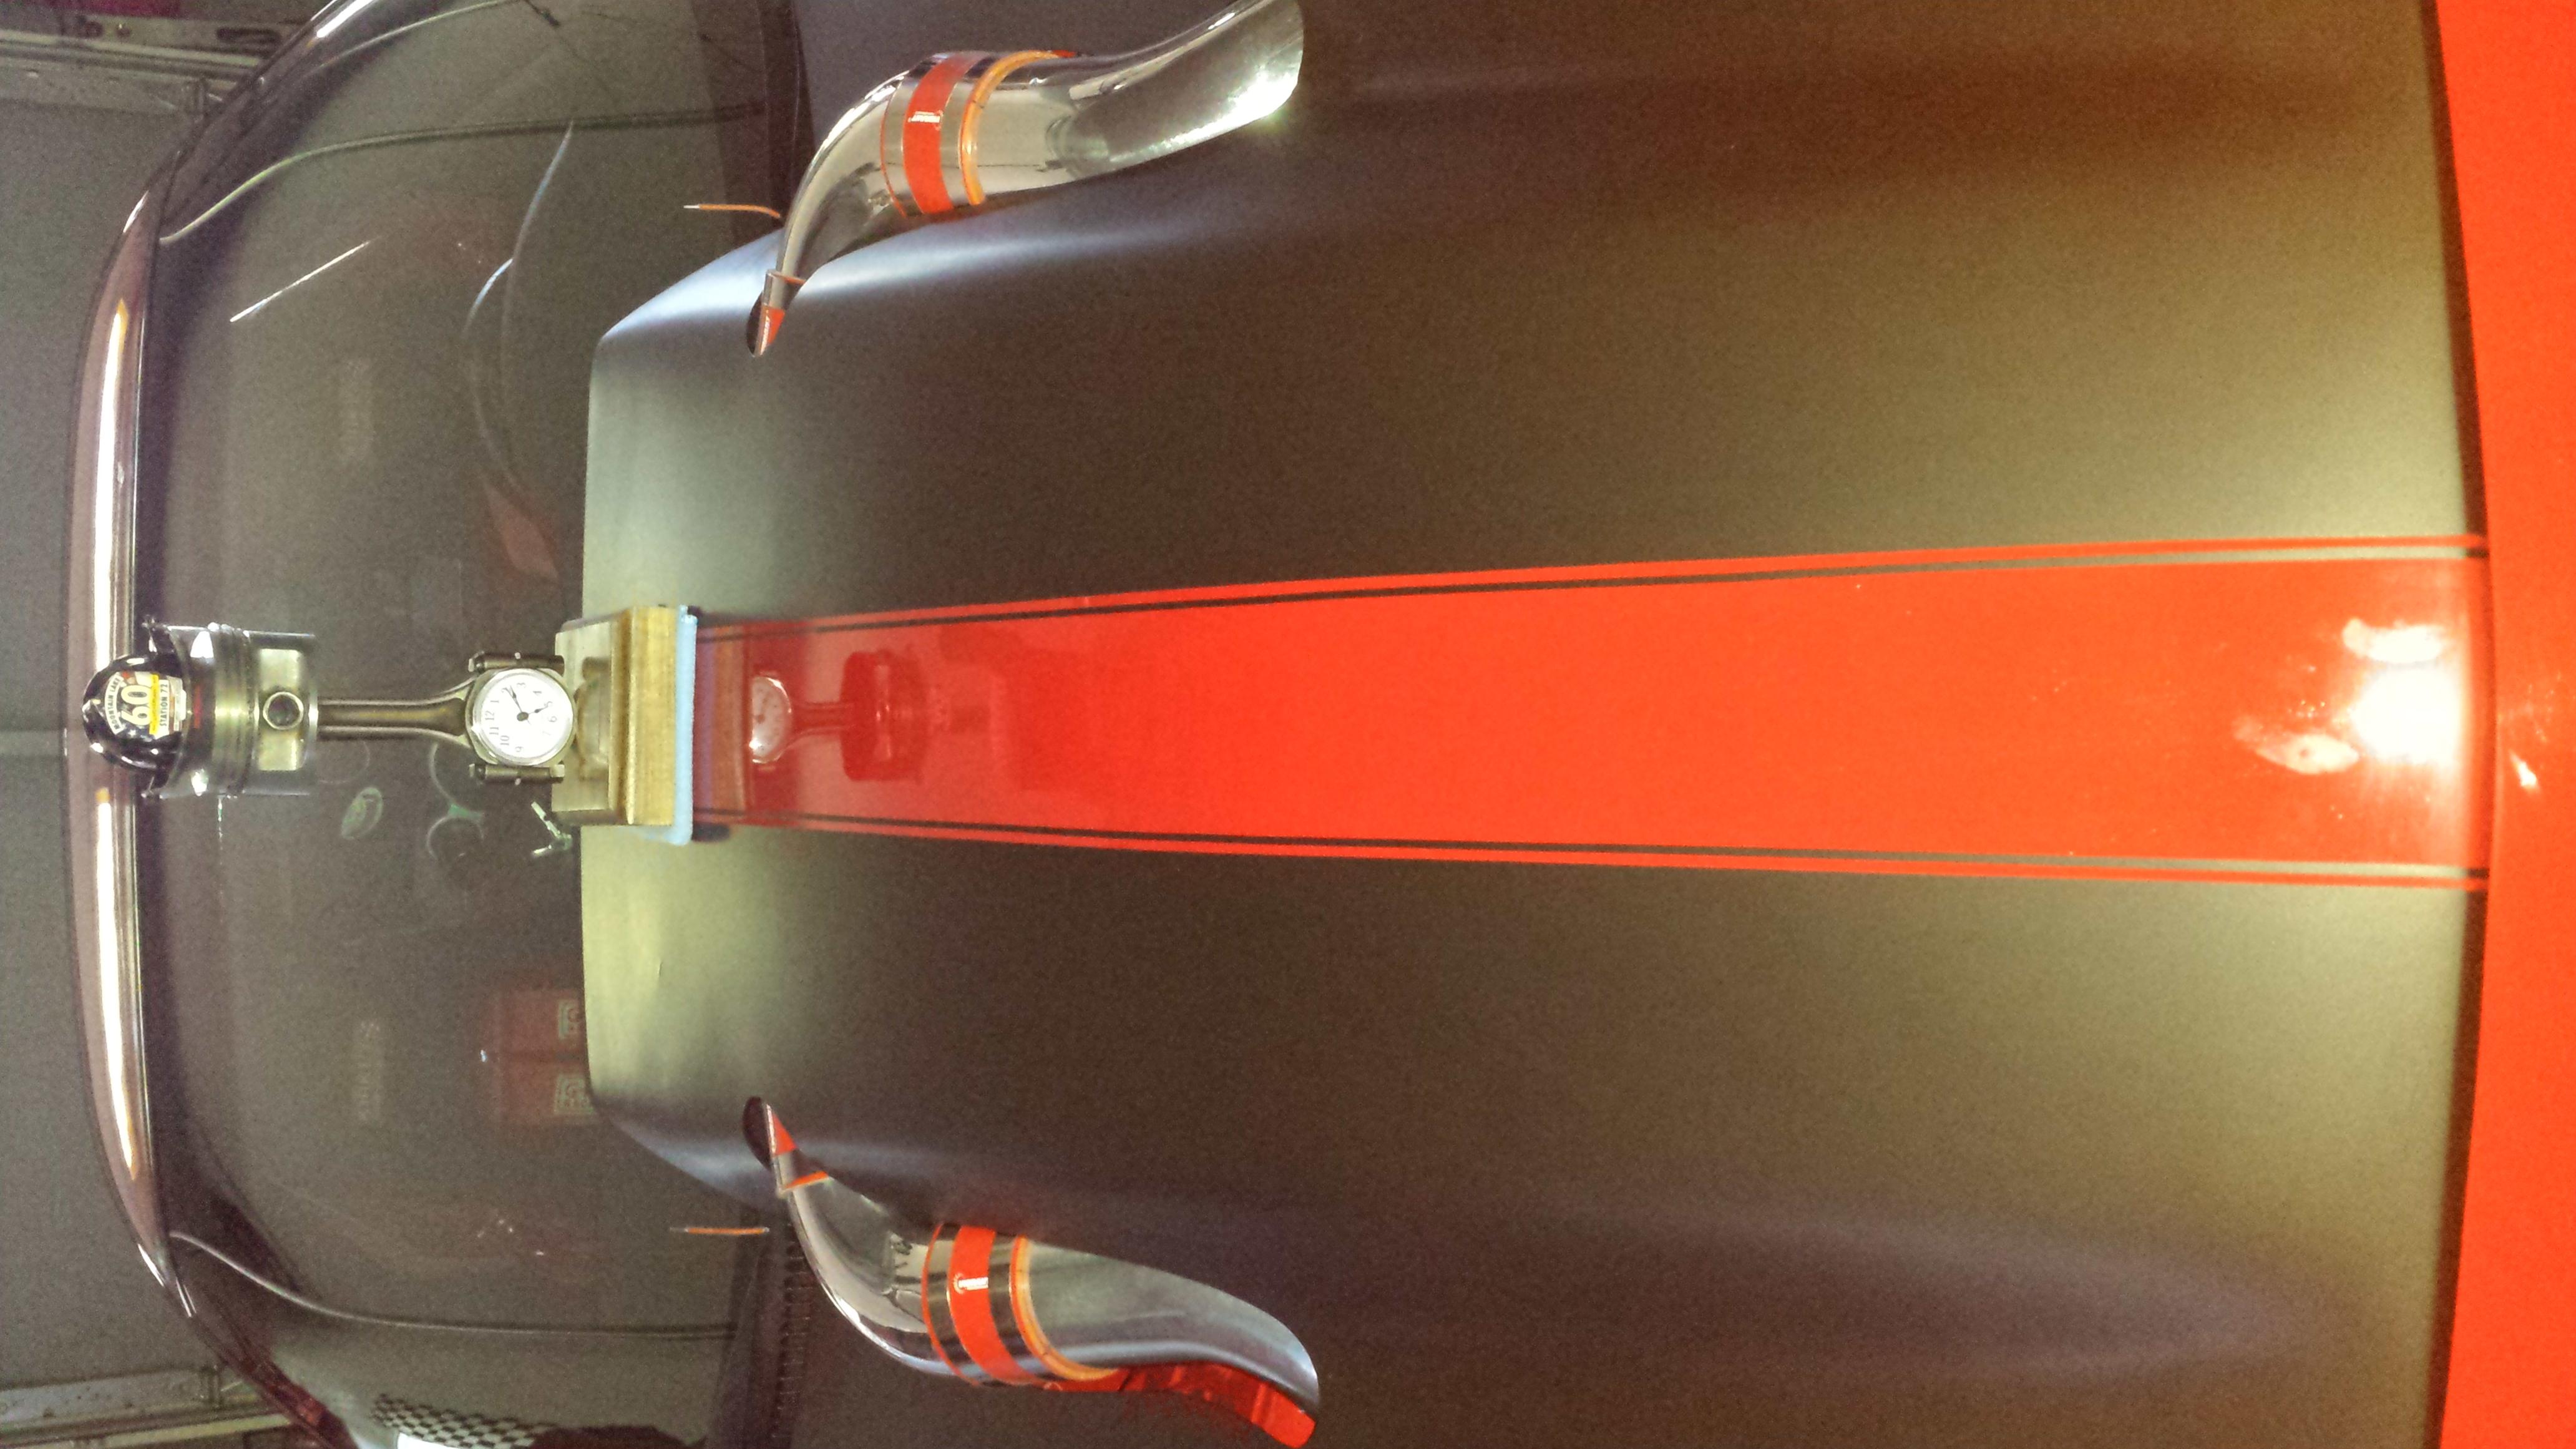 908 Motorsports Magazine on Feedspot - Rss Feed